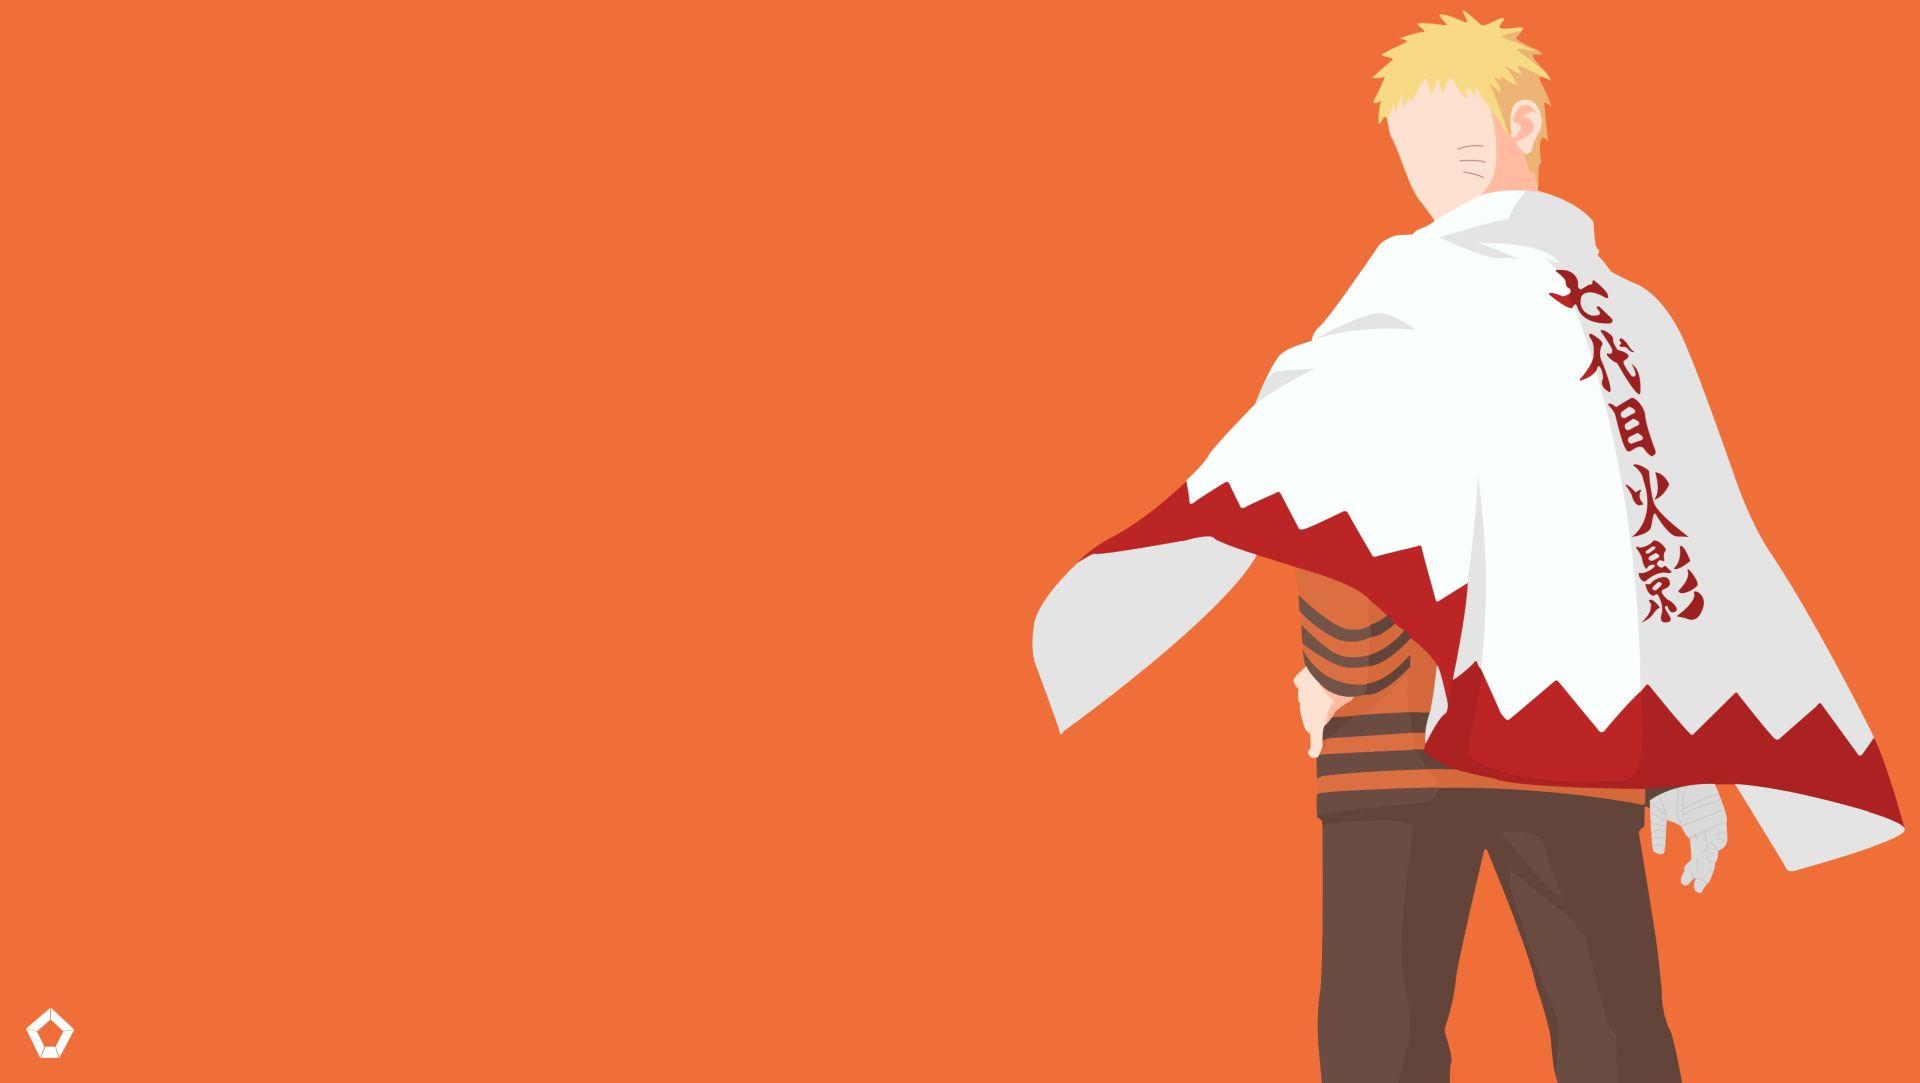 Naruto Minimalist, HD Desktop Wallpaper